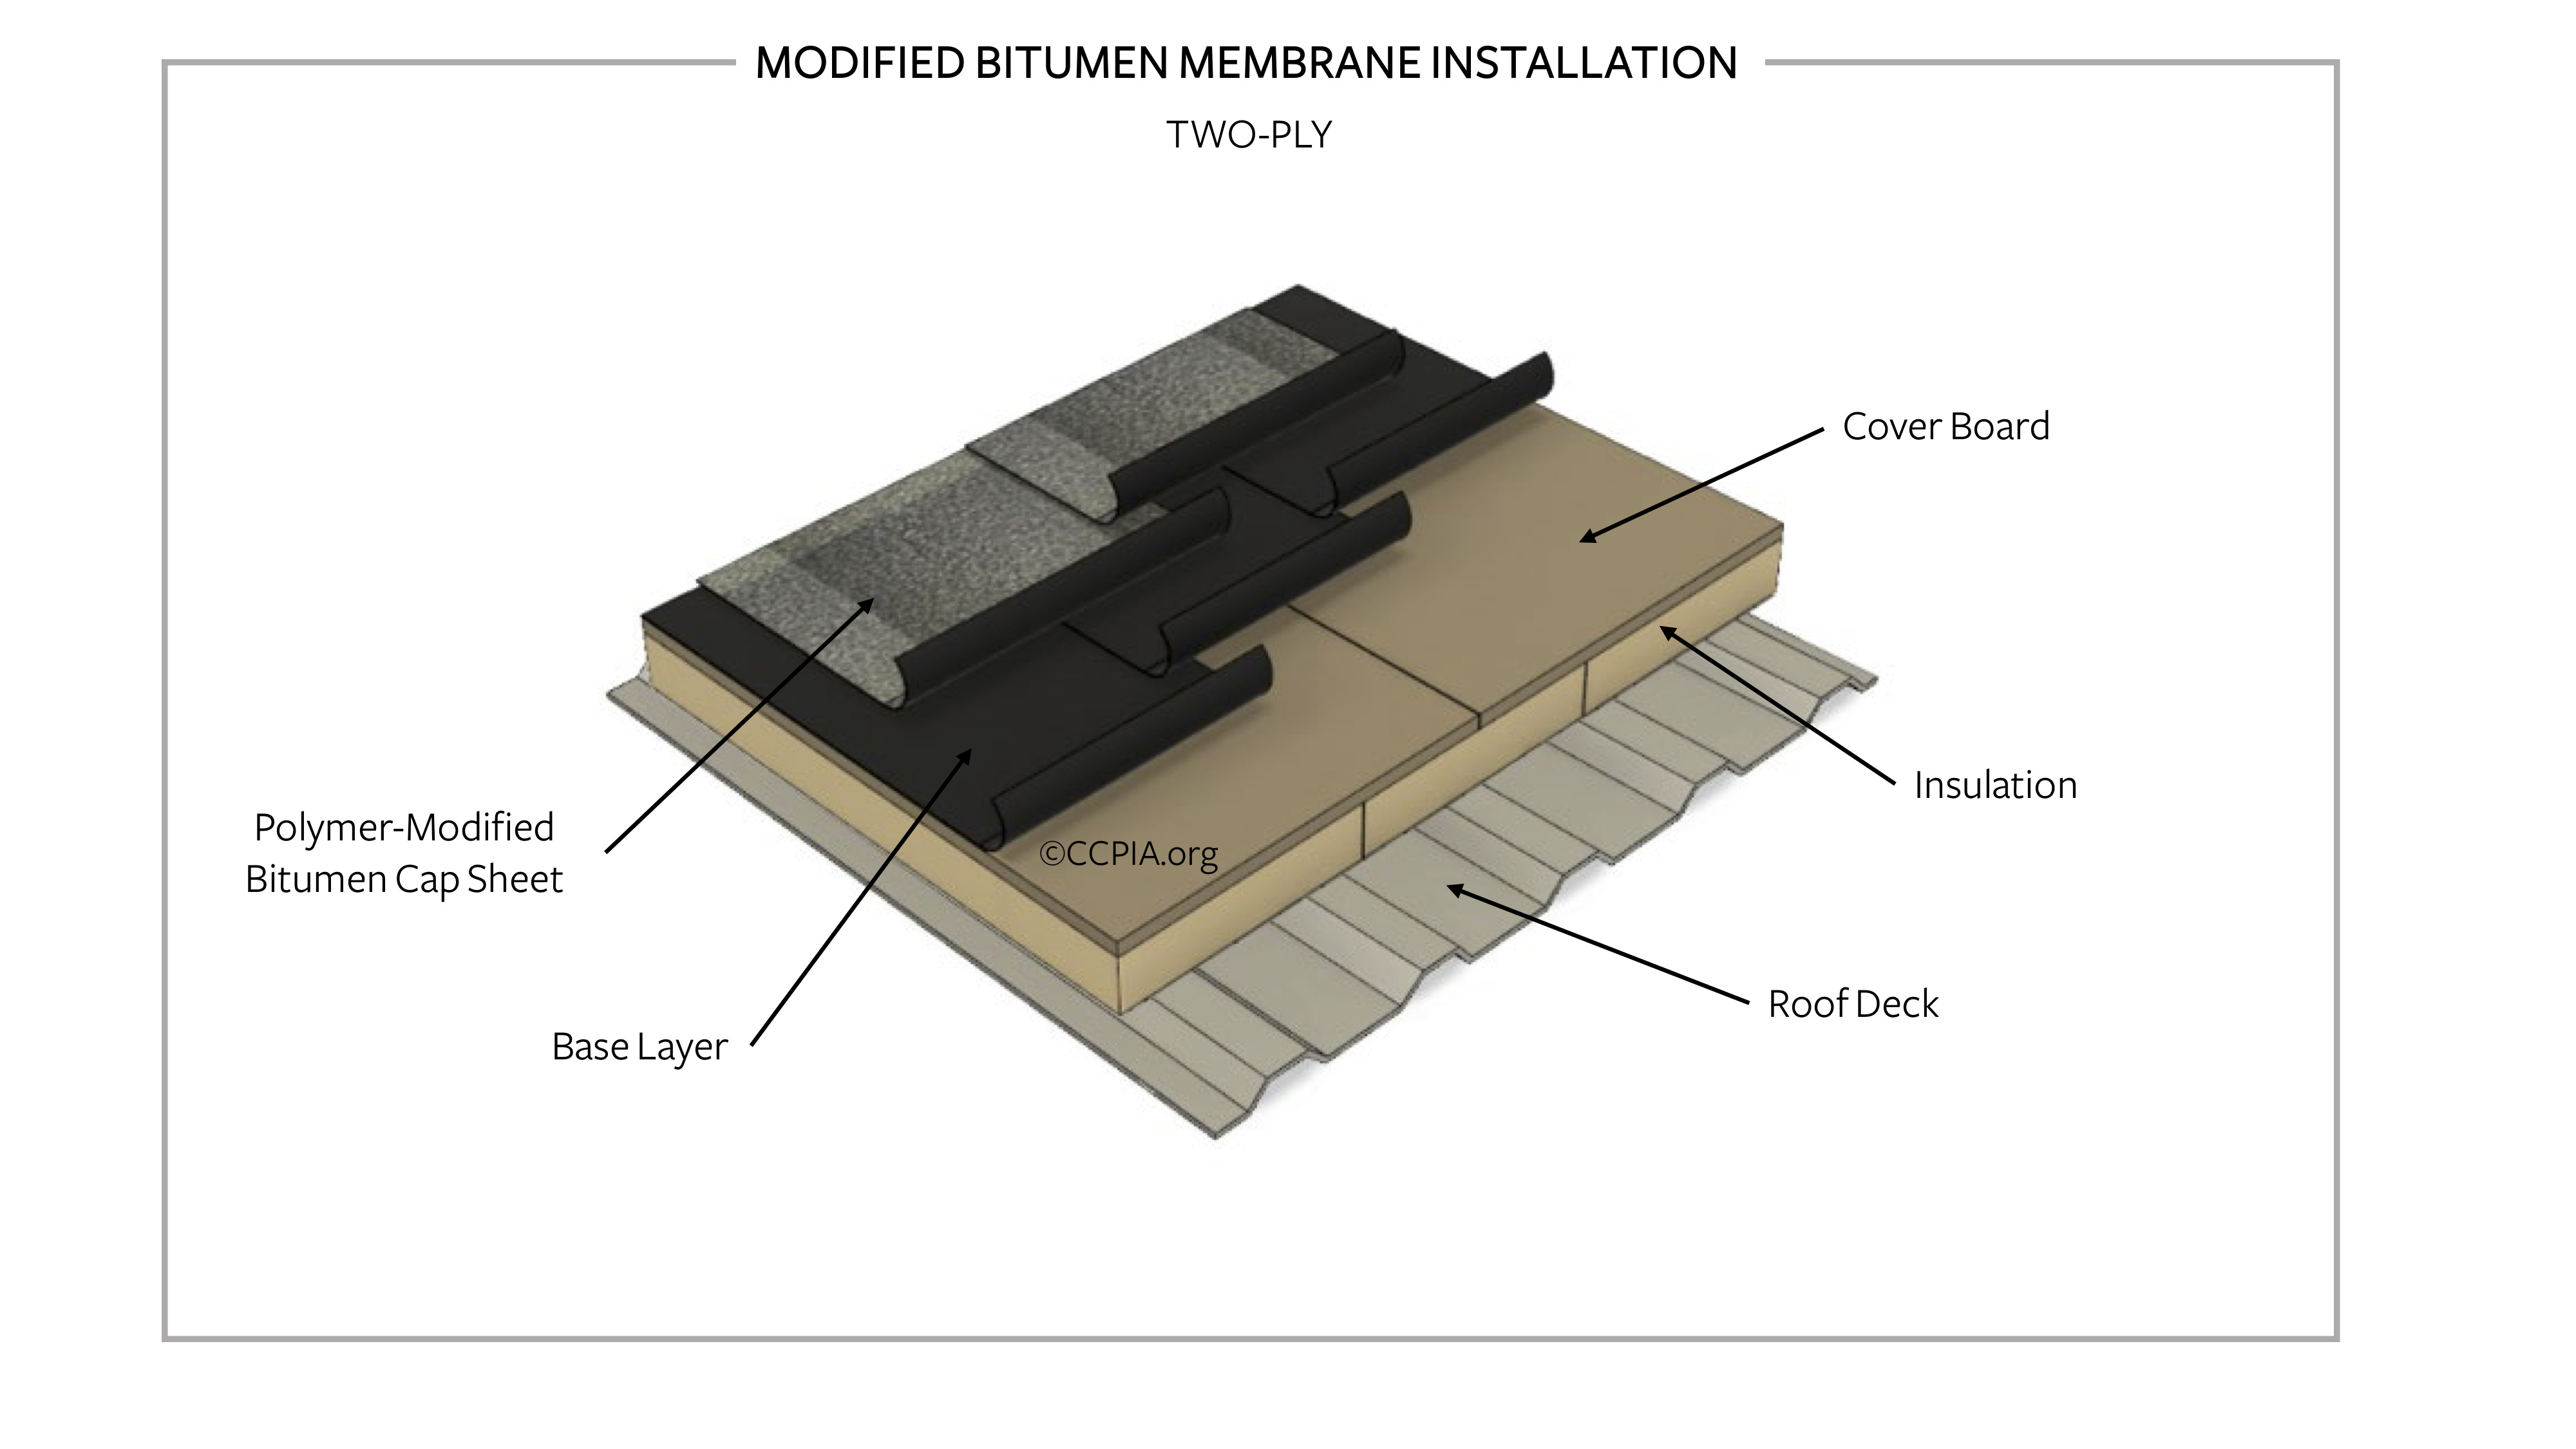 Modified bitumen installation, 2-ply.